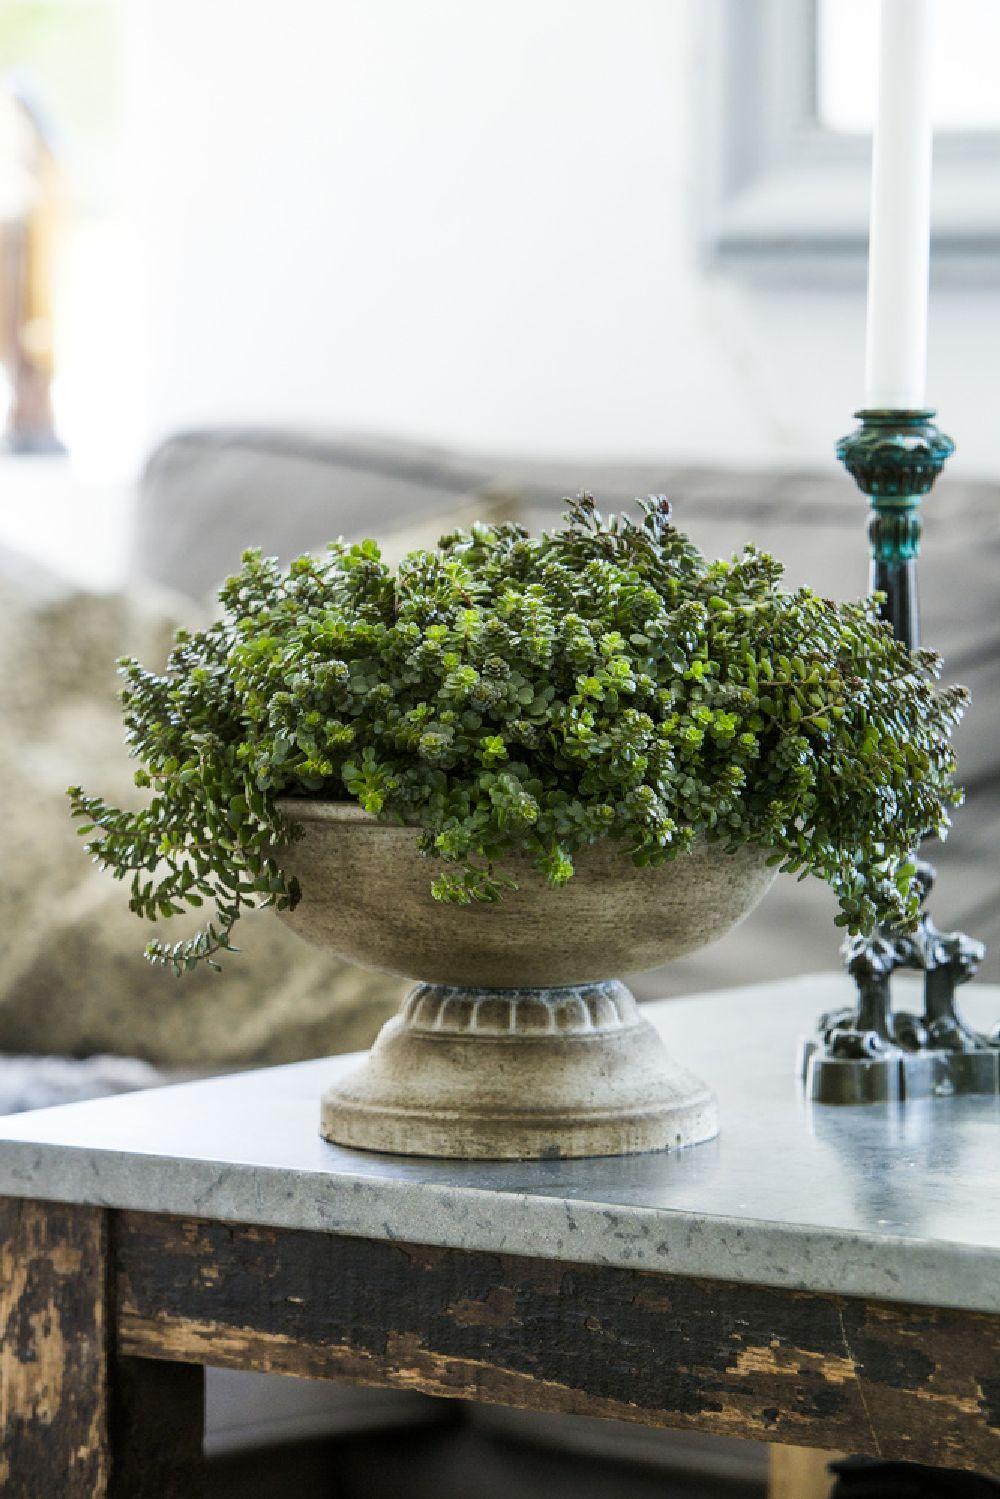 adelaparvu.com despre plante la ghiveci deosebite, Text Carli Marian, In foto Sedum makinoi, Foto Floradania (3)